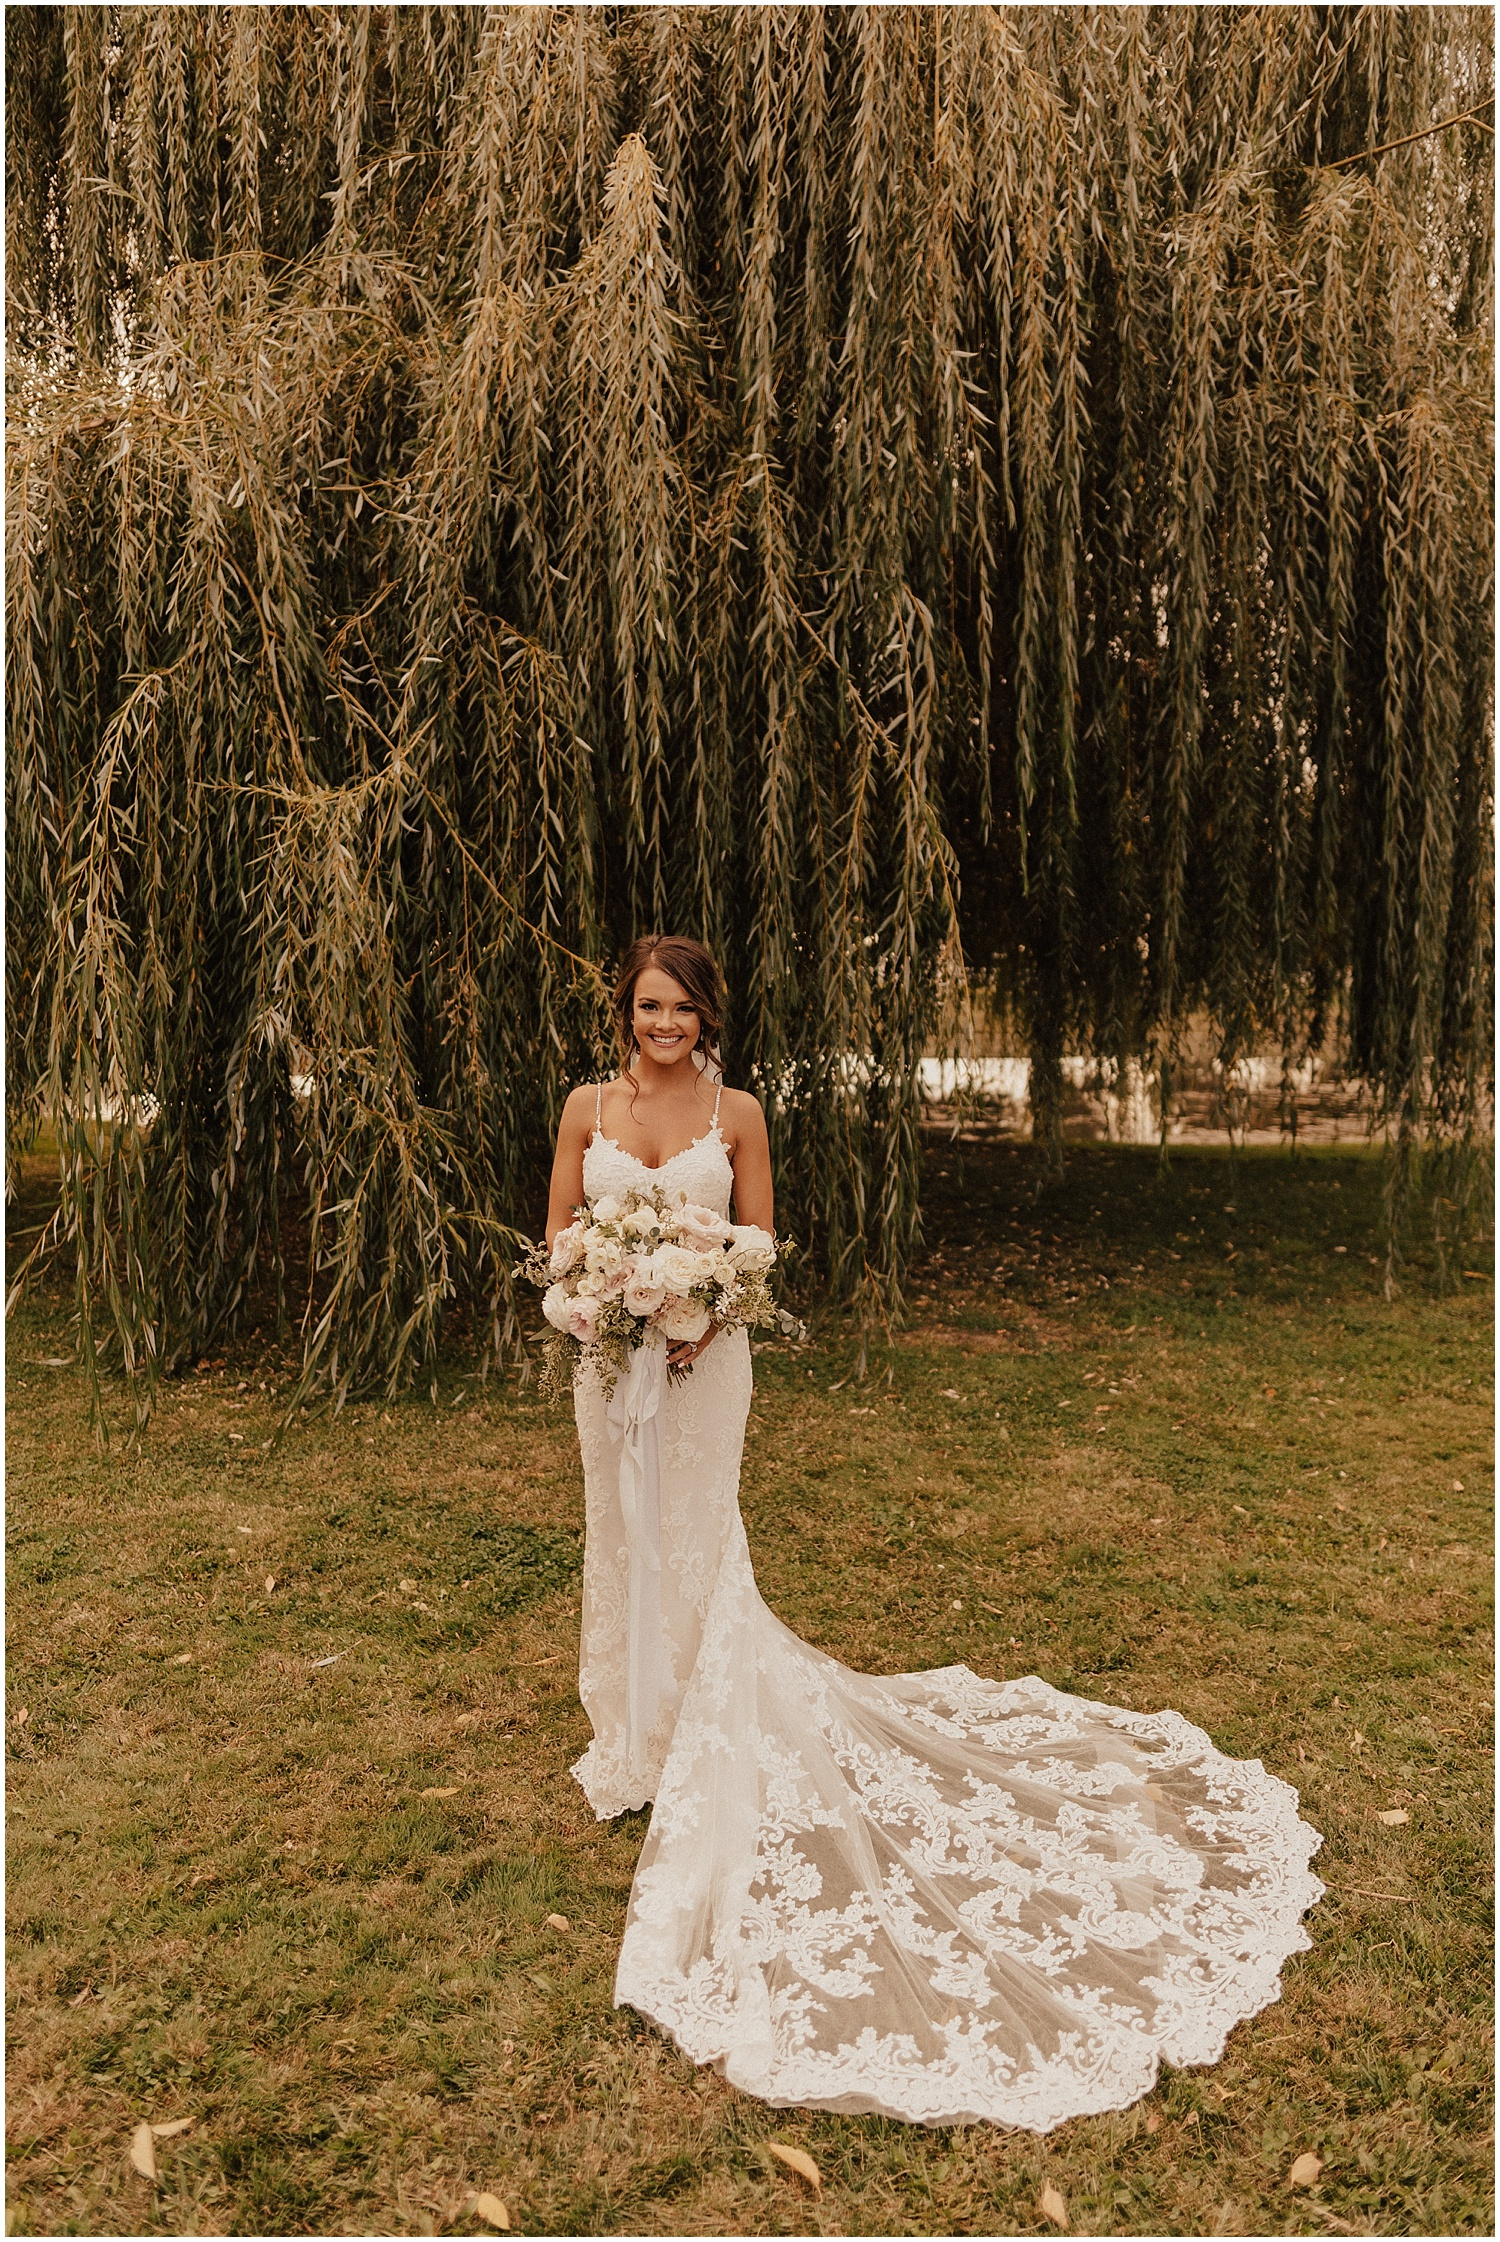 whimsical-summer-wedding-boise-idaho-las-vegas-bride154.jpg